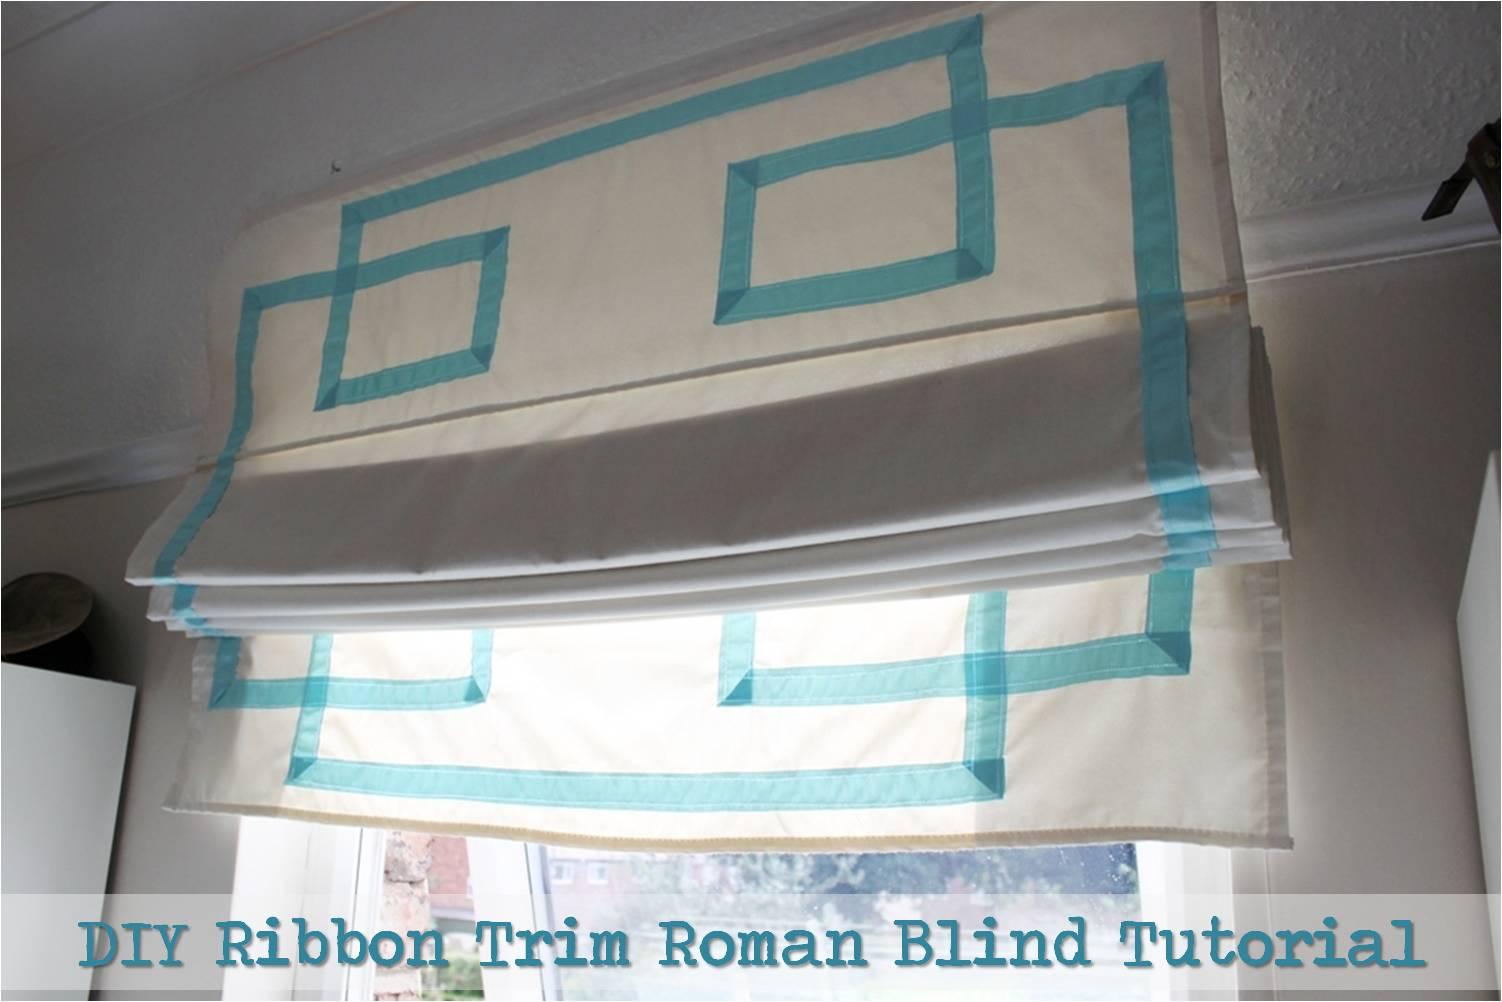 Roman Blind Diy Cheap Easy Before After Diy Ribbon Trim Roman Blind Tutorial